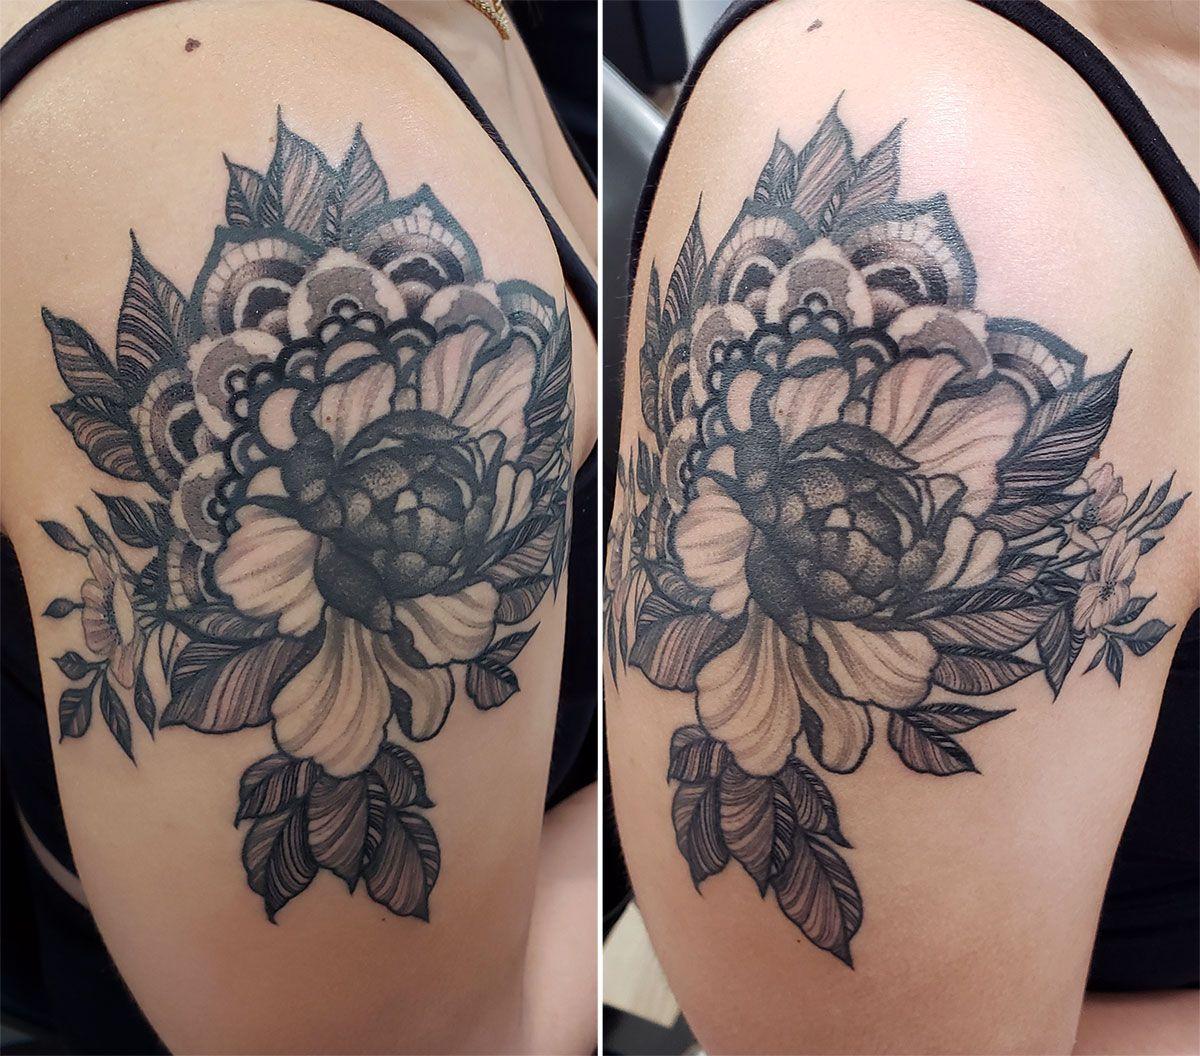 Pretty floral tattoo done by Doozer Soto #floraltattoo #paisleytattoo #dotworktattoo #doozersototattoo #tagtheqc #midwesttattoo #bngtattoo #blackandgreytattoo #bnginksociety